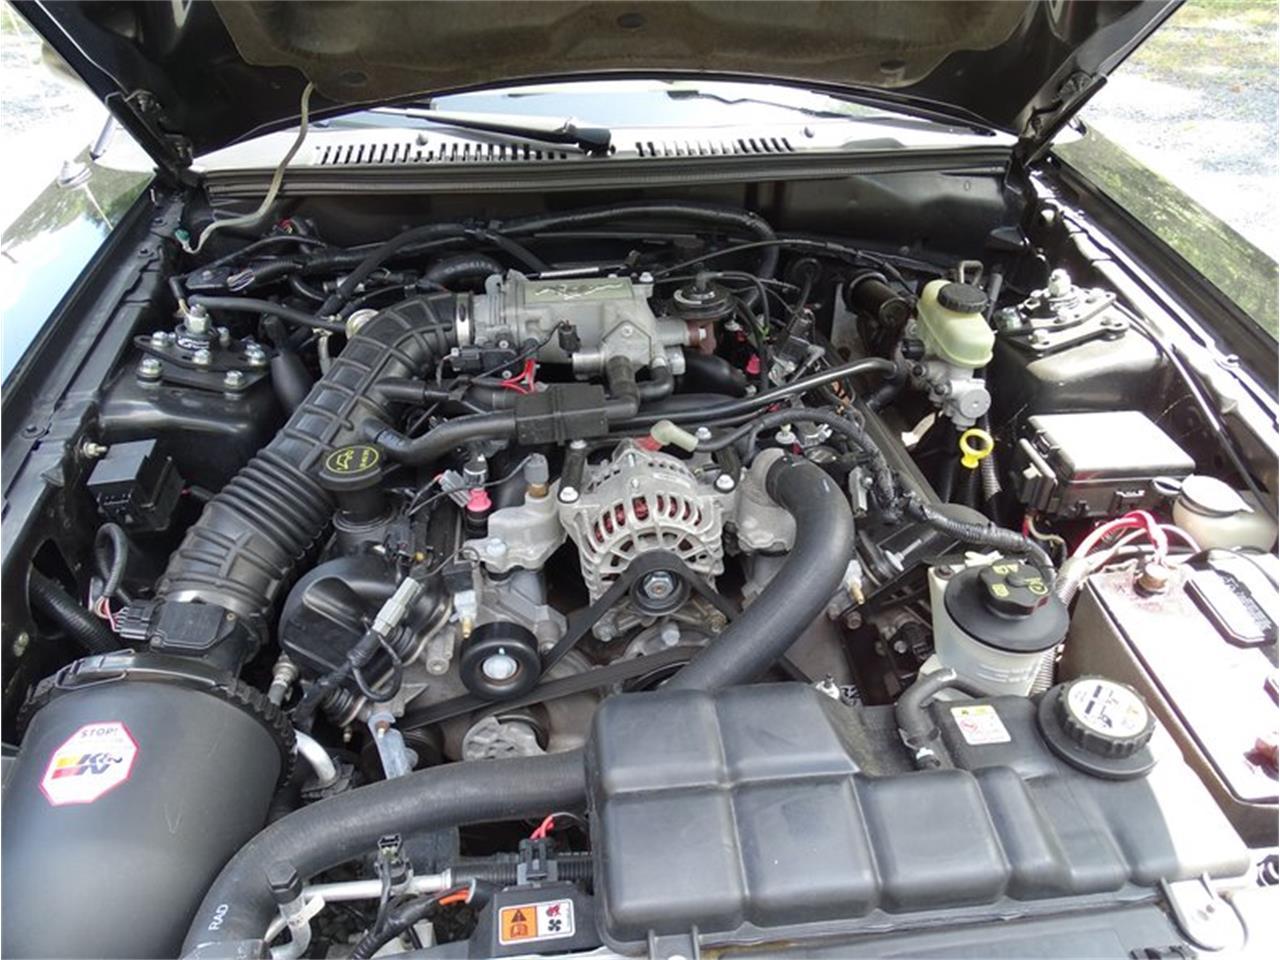 2003 Ford Mustang (CC-1387703) for sale in Greensboro, North Carolina